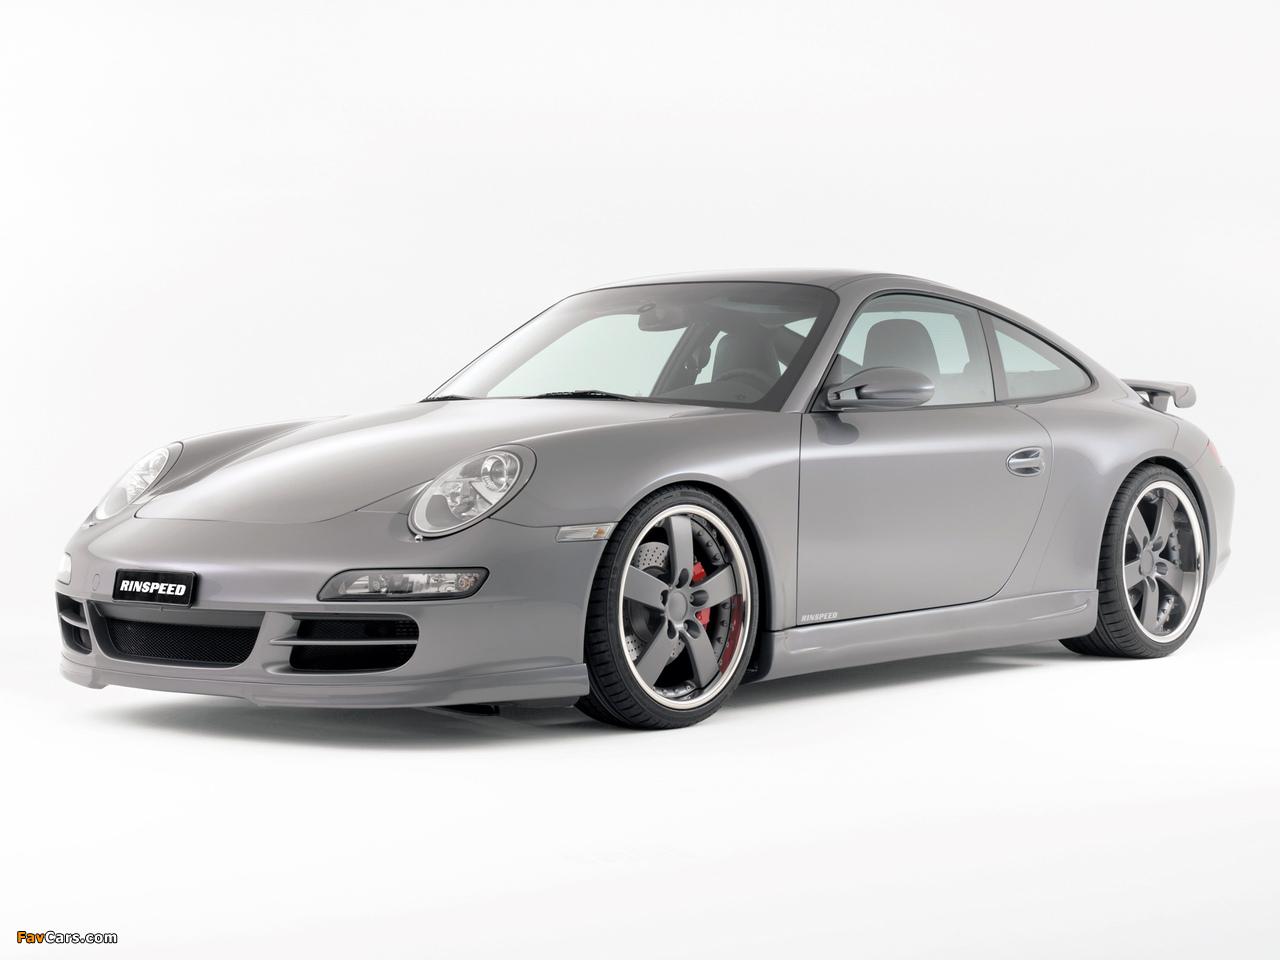 Rinspeed Porsche 911 Carrera Coupe (997) wallpapers (1280 x 960)